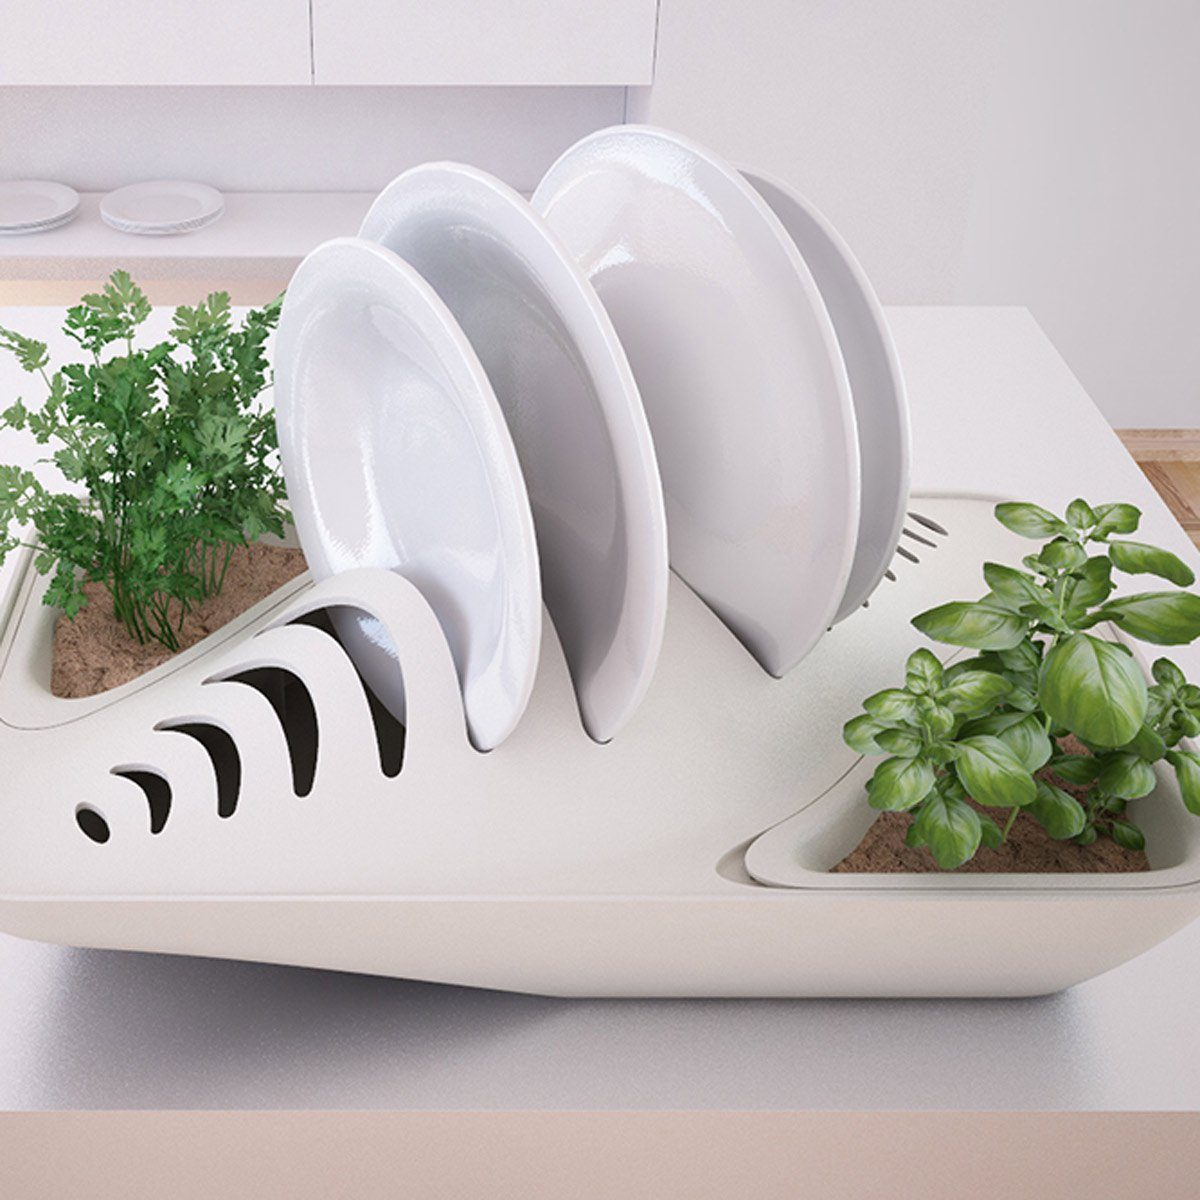 Herb Garden Dish Drying Rack